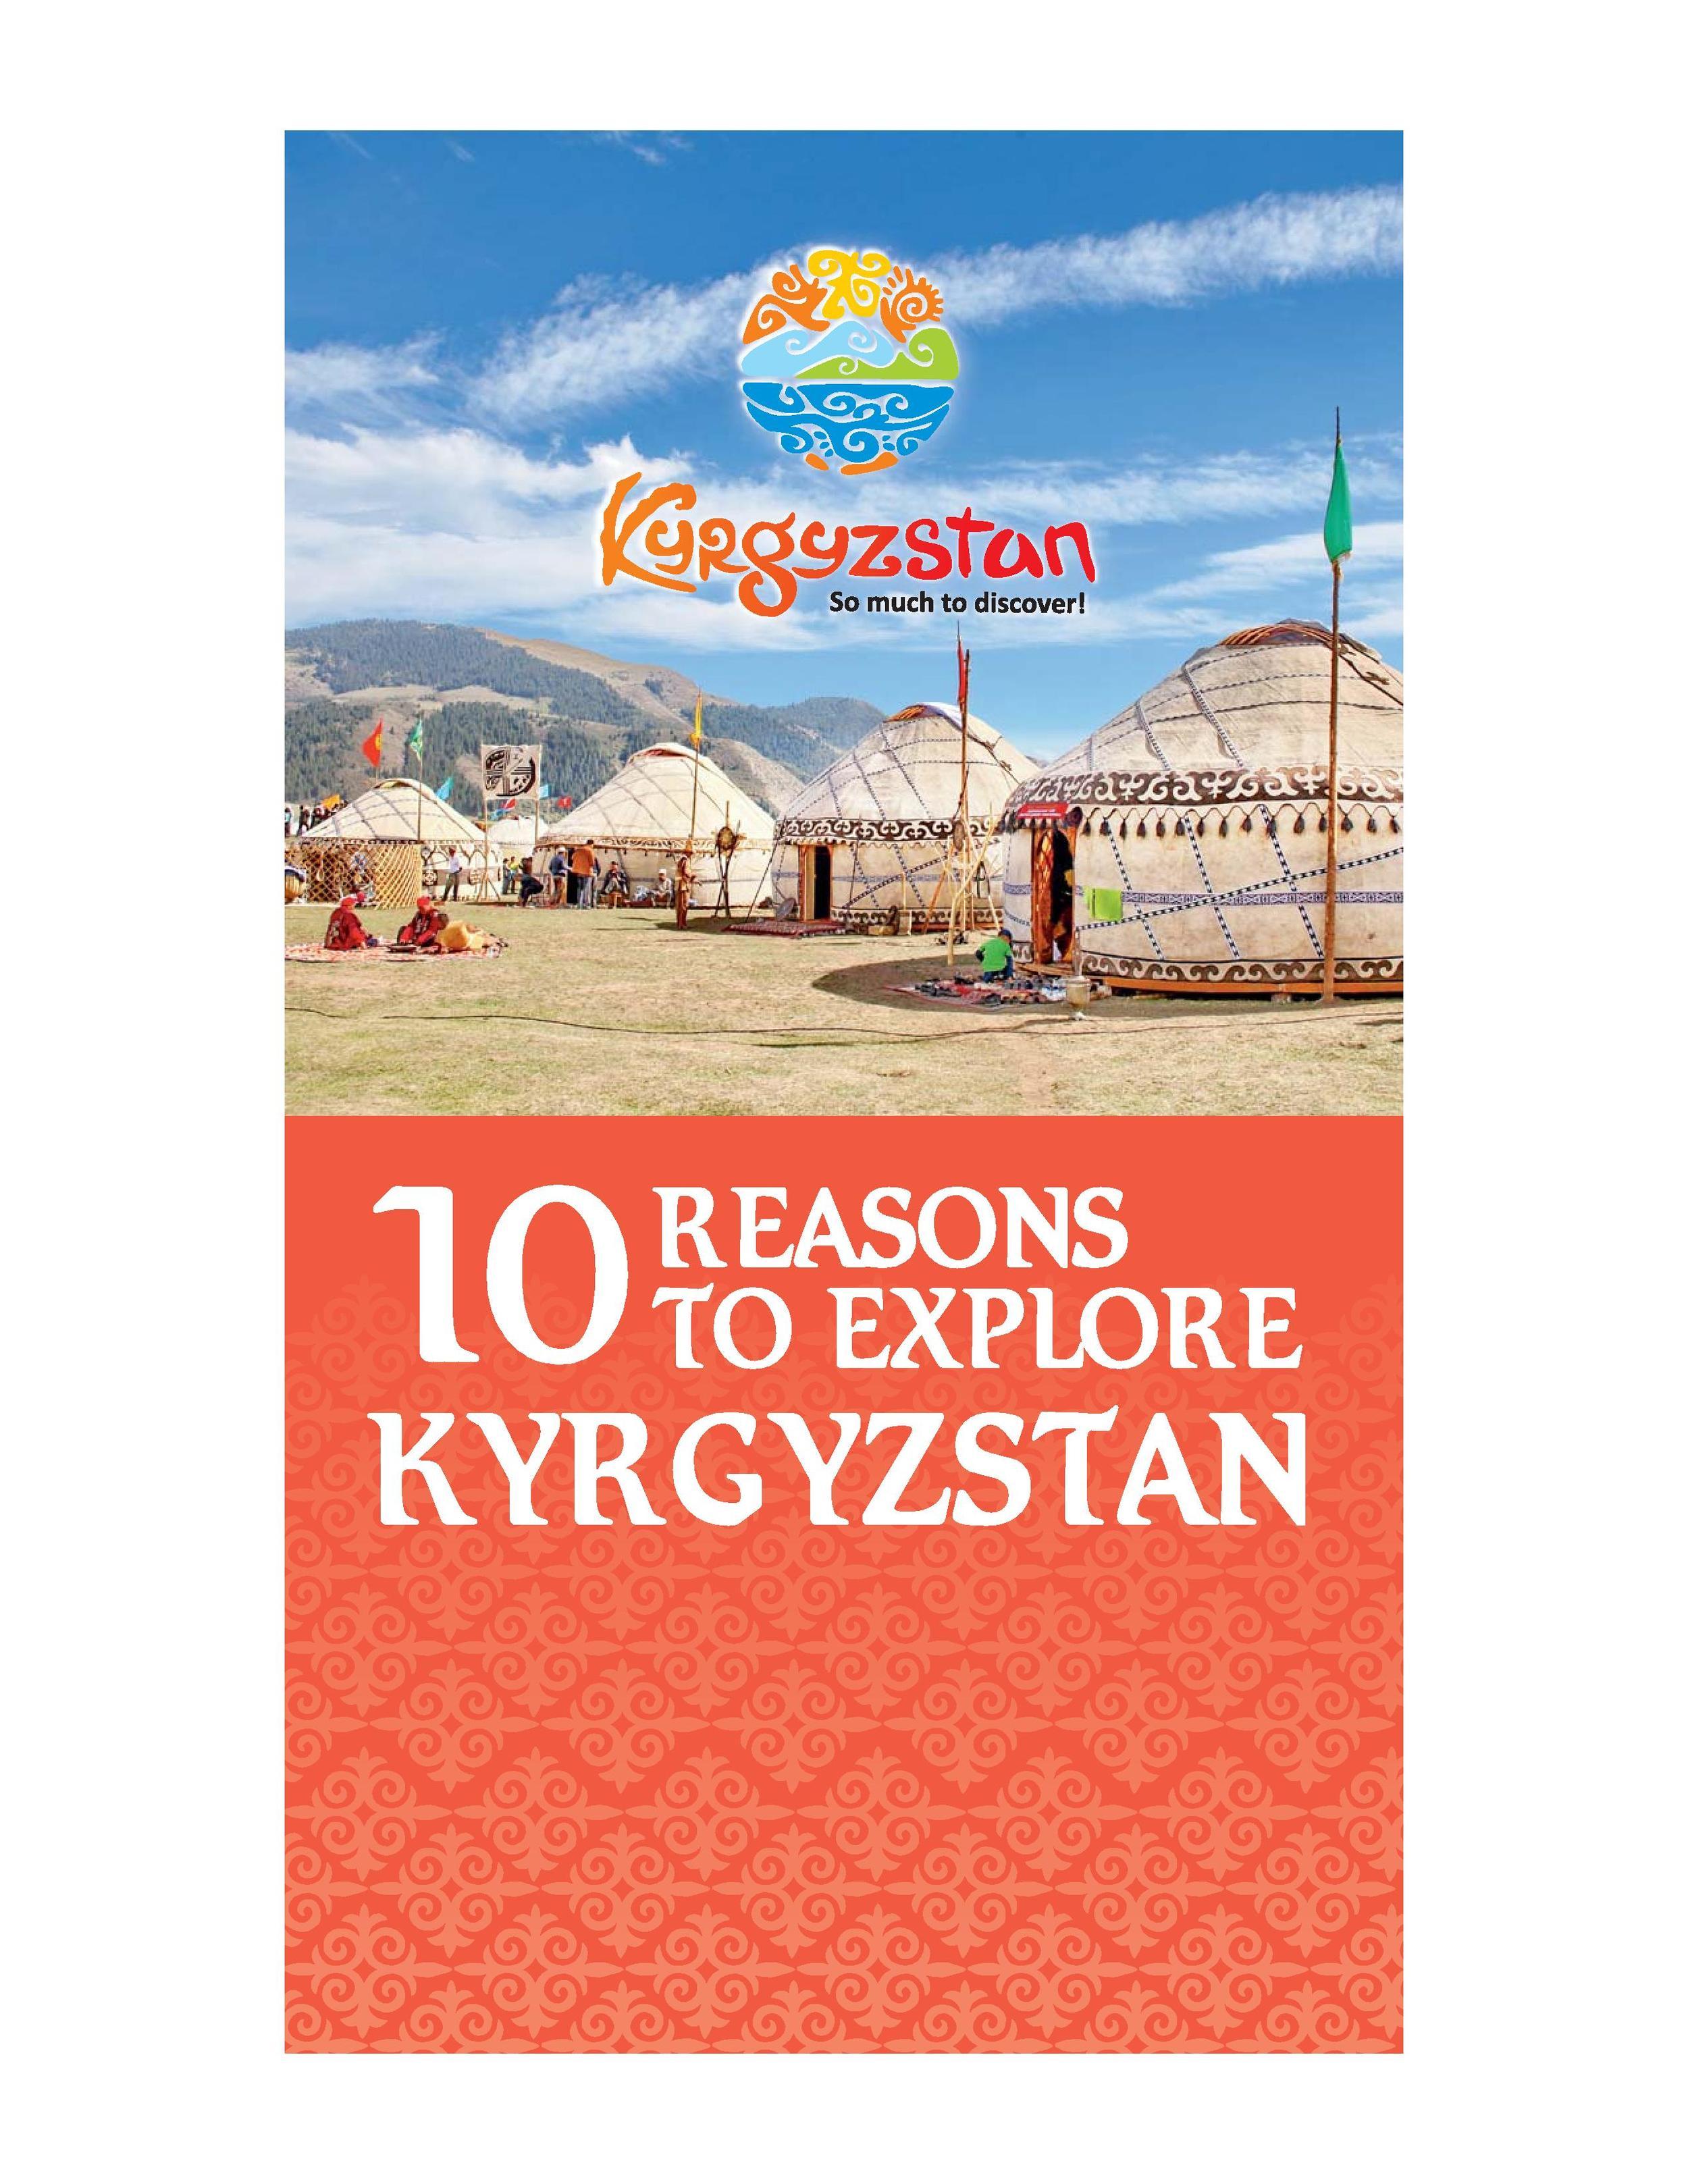 10 reasons to explore Kyrgyzstan_SMALL-page-001.jpg